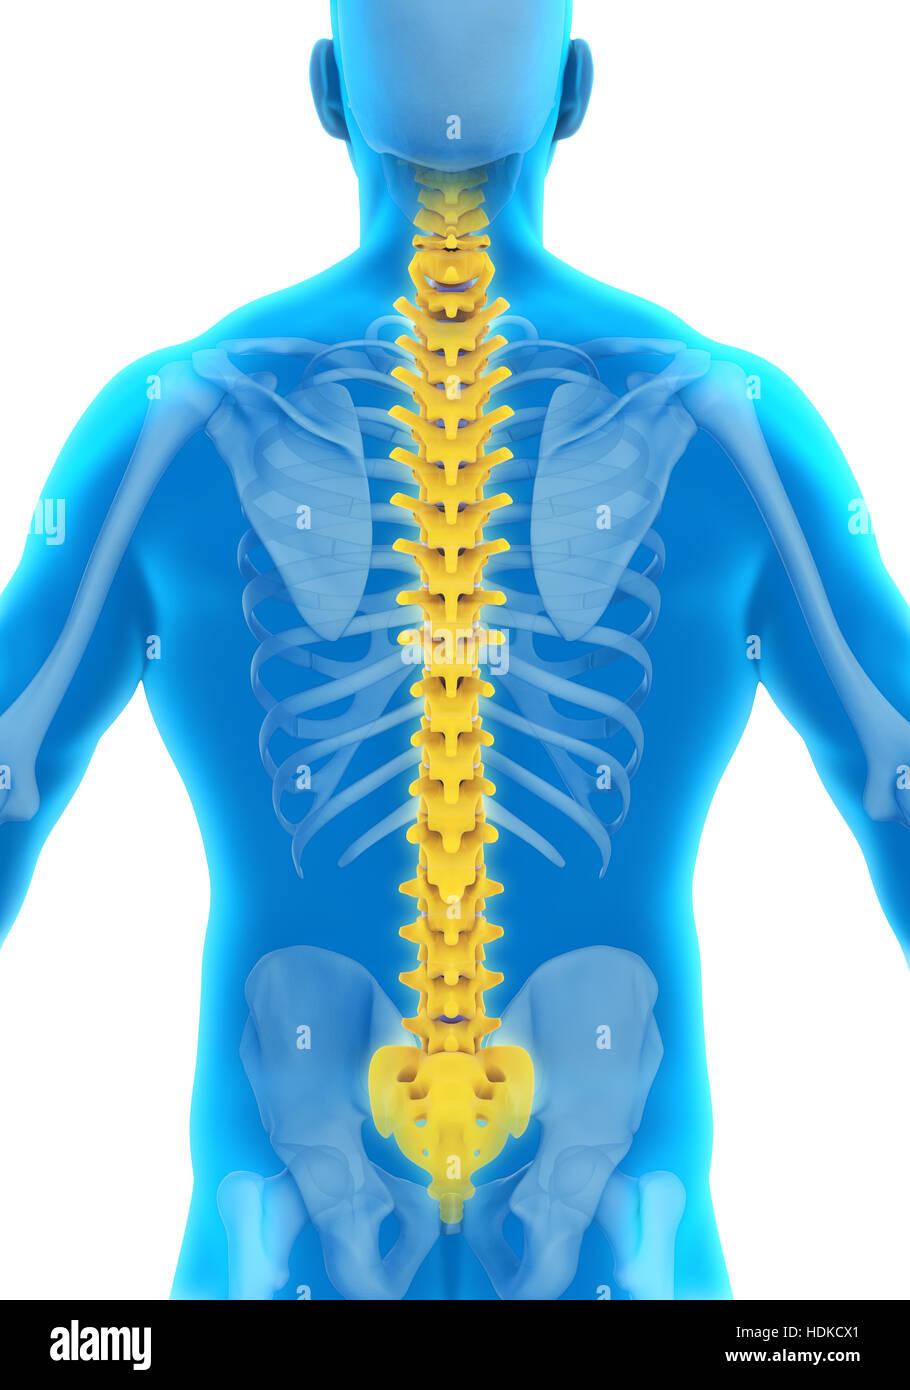 Spinal Cord Injury Stockfotos & Spinal Cord Injury Bilder - Alamy